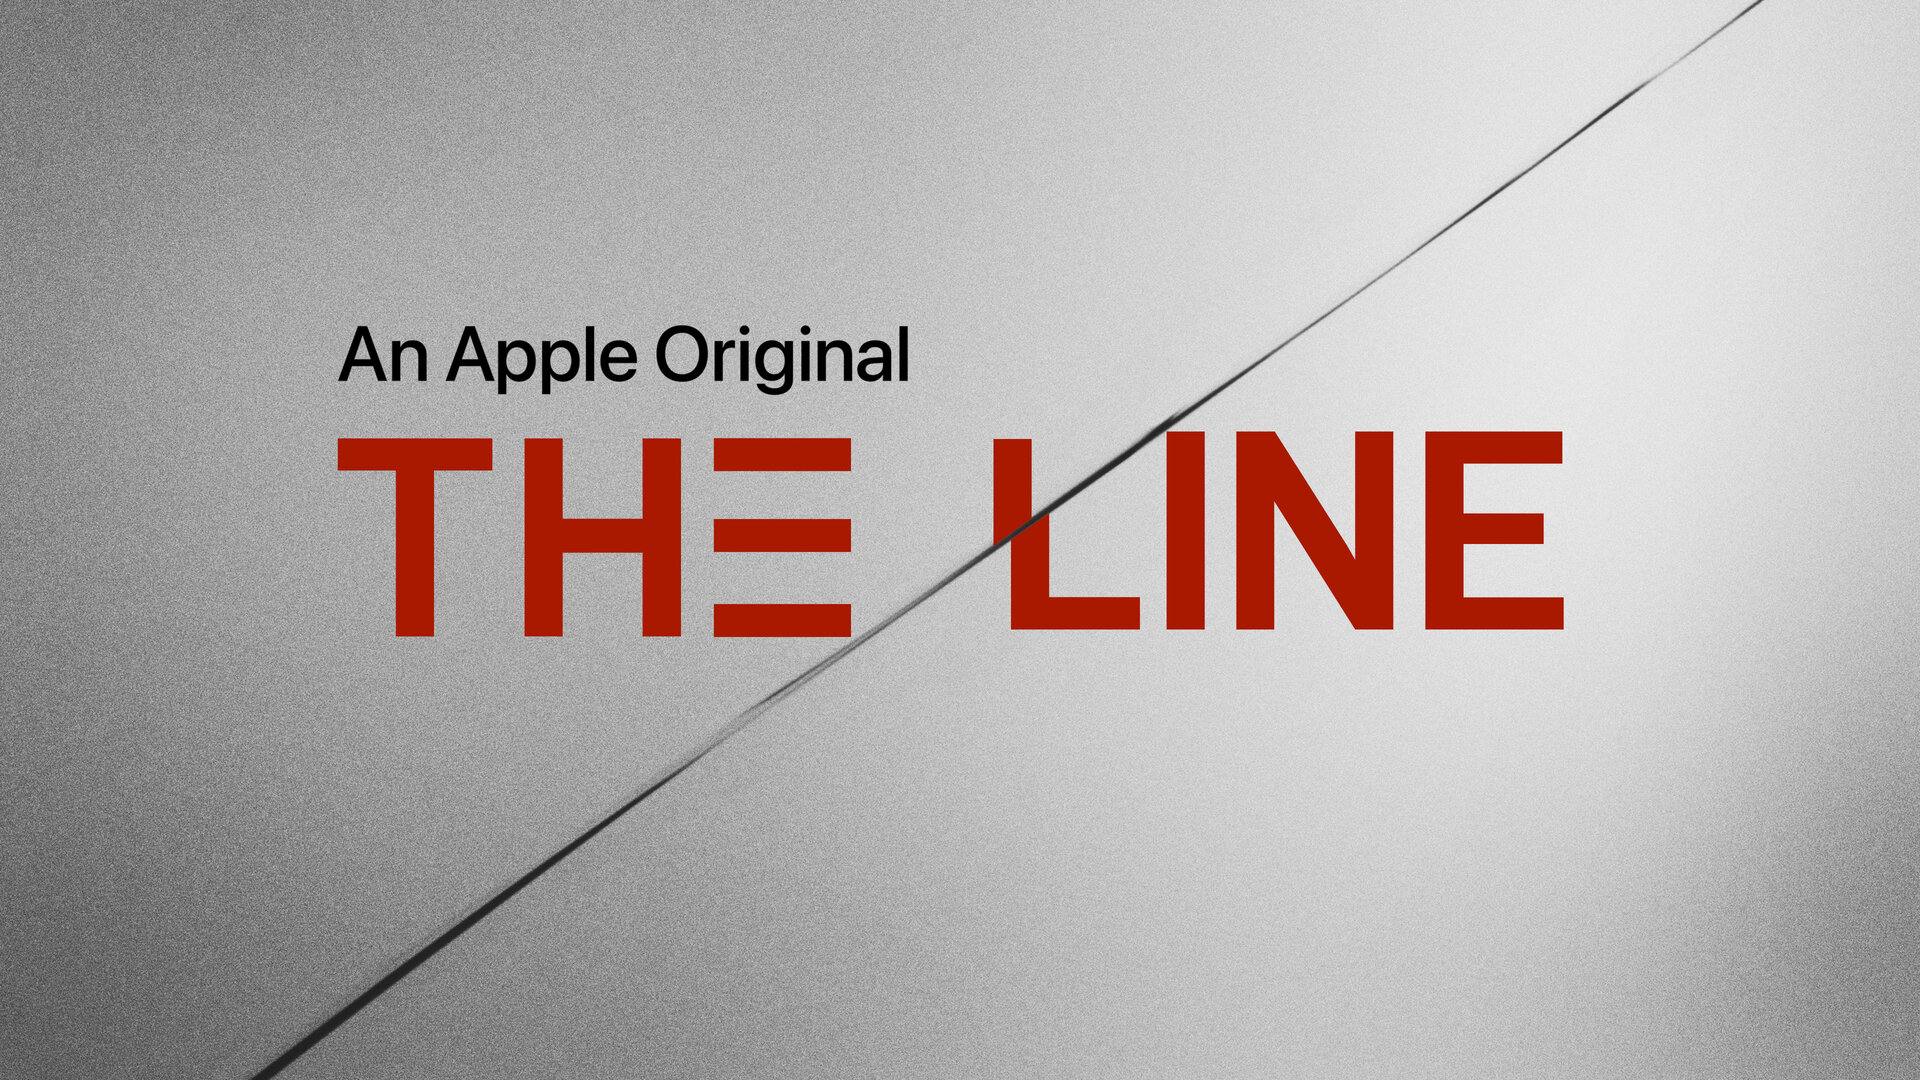 Review: Apple's original podcast 'The Line' is a storytelling tour de force thumbnail